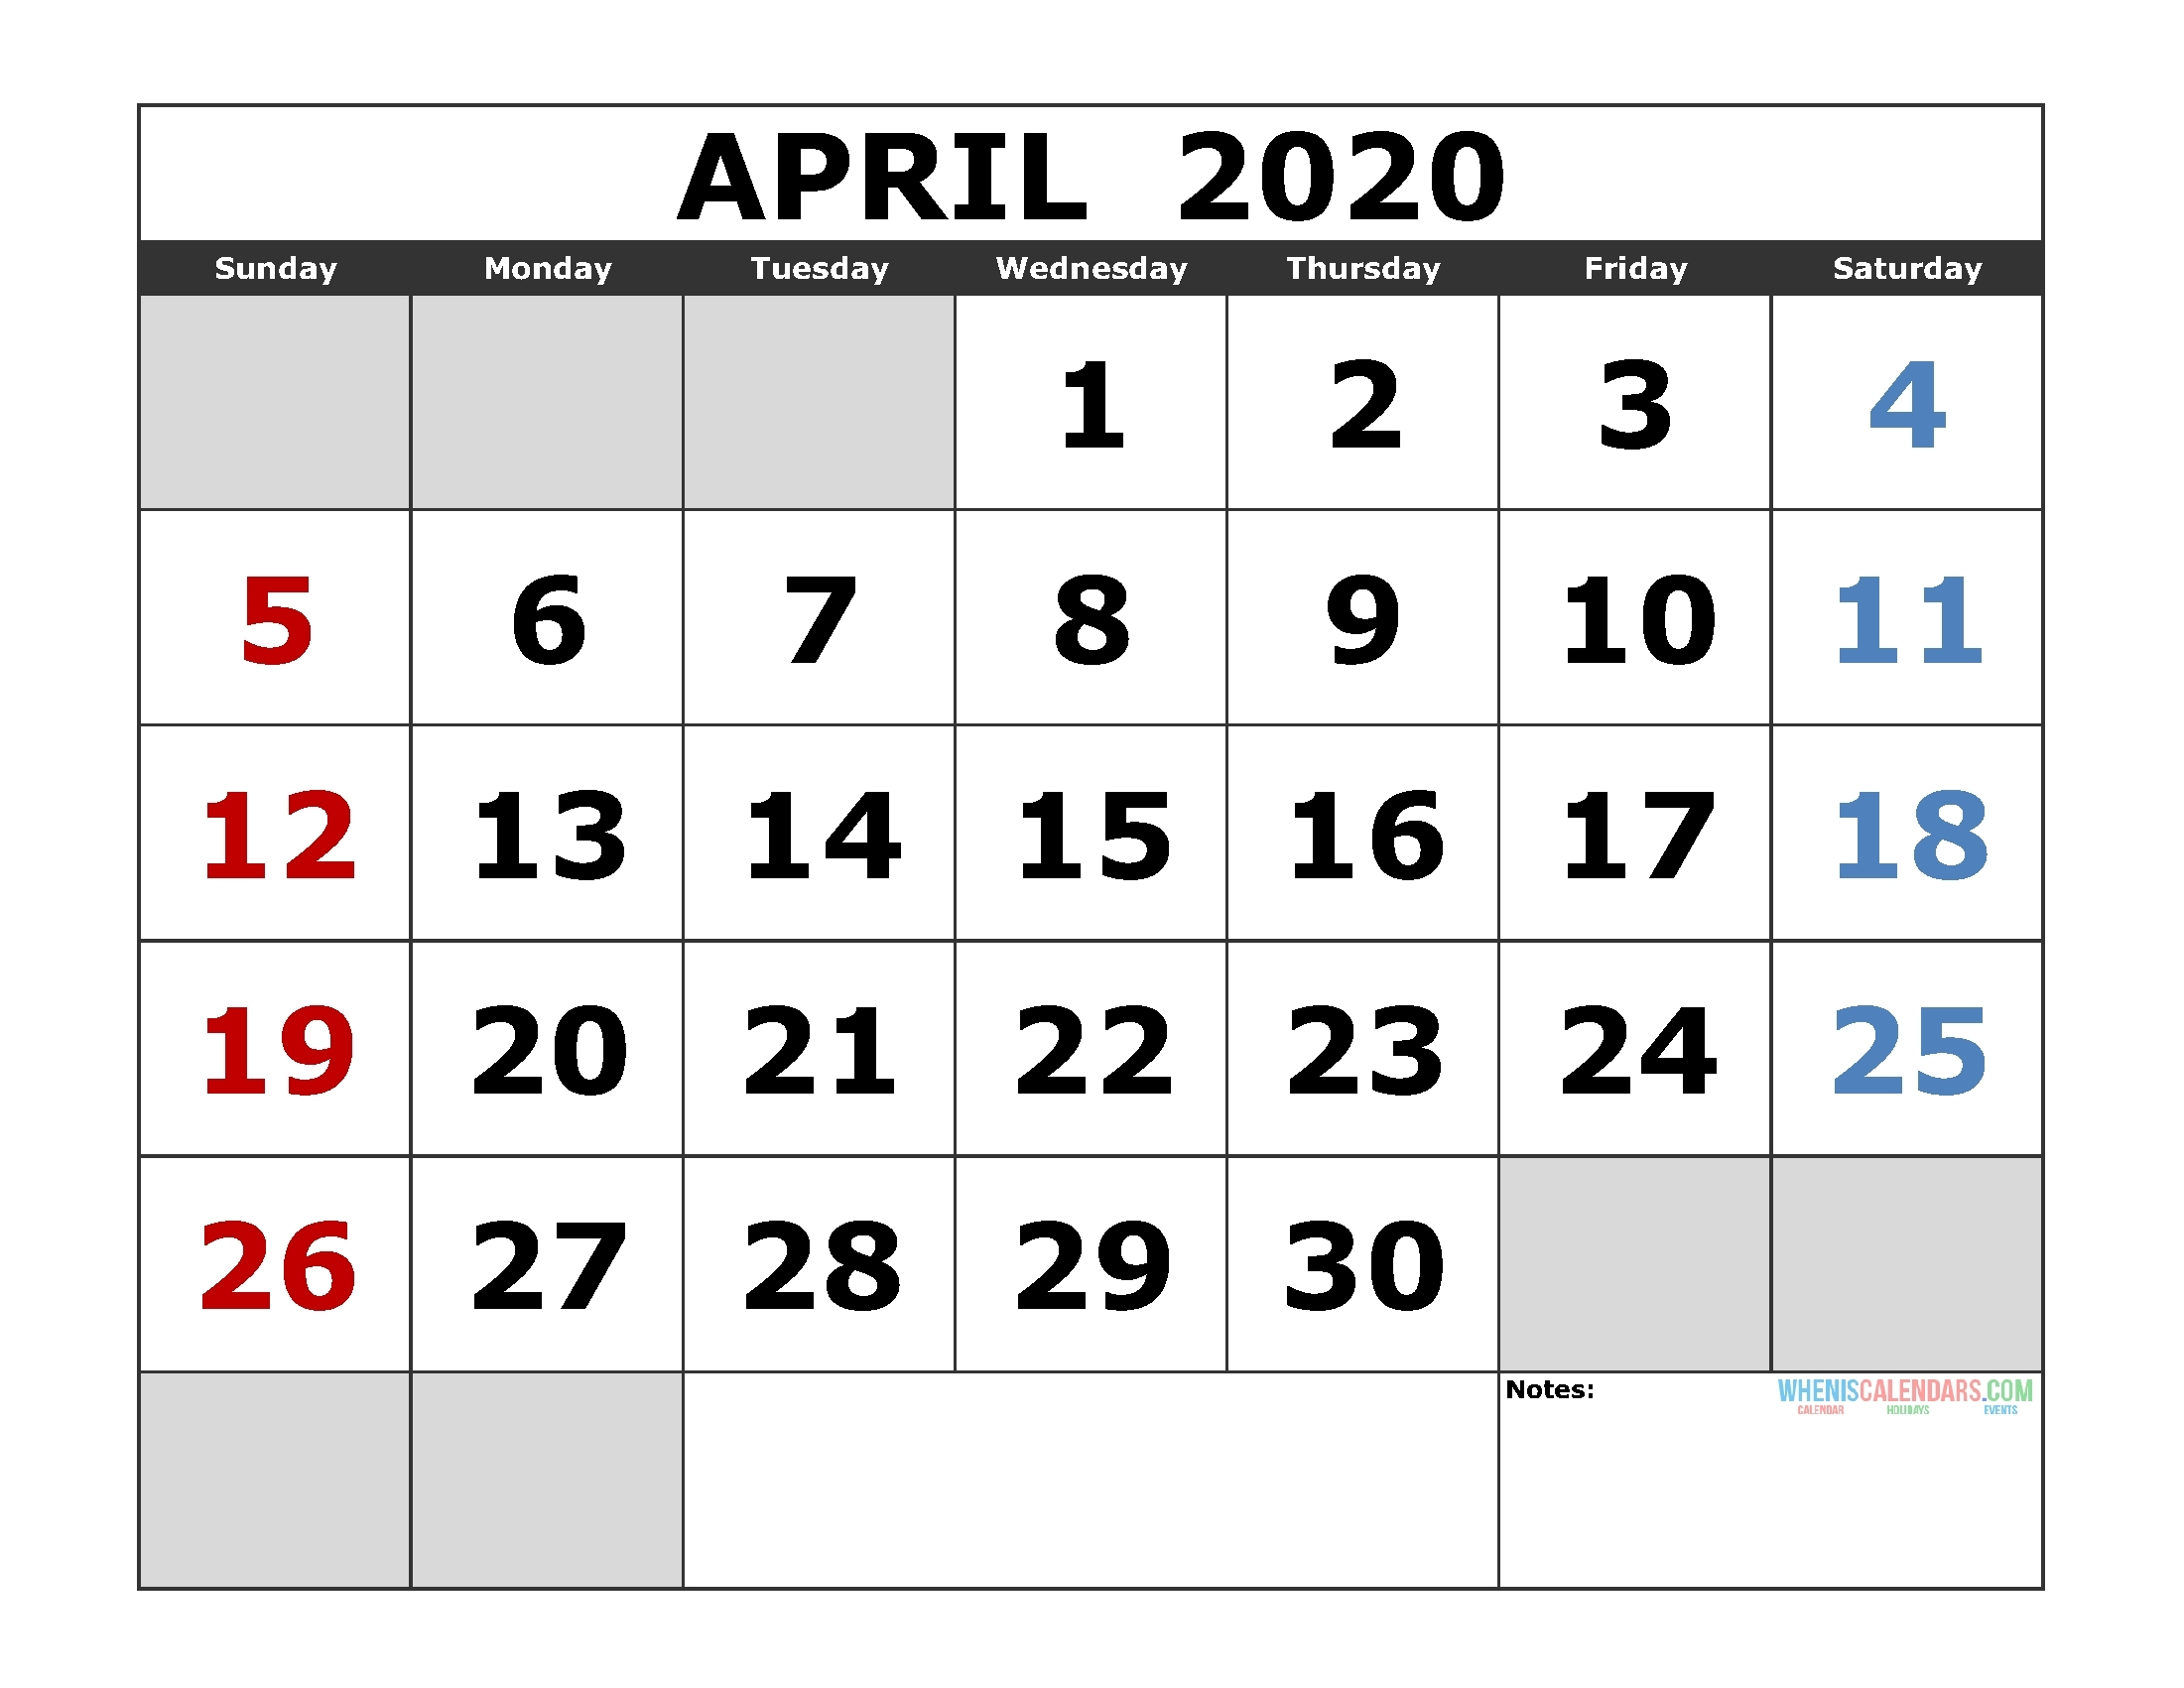 Calendar 2020 Printable With Holidays Nz - 2019 Yearly Calendar_Blank Calendar 2020-19 Pdf